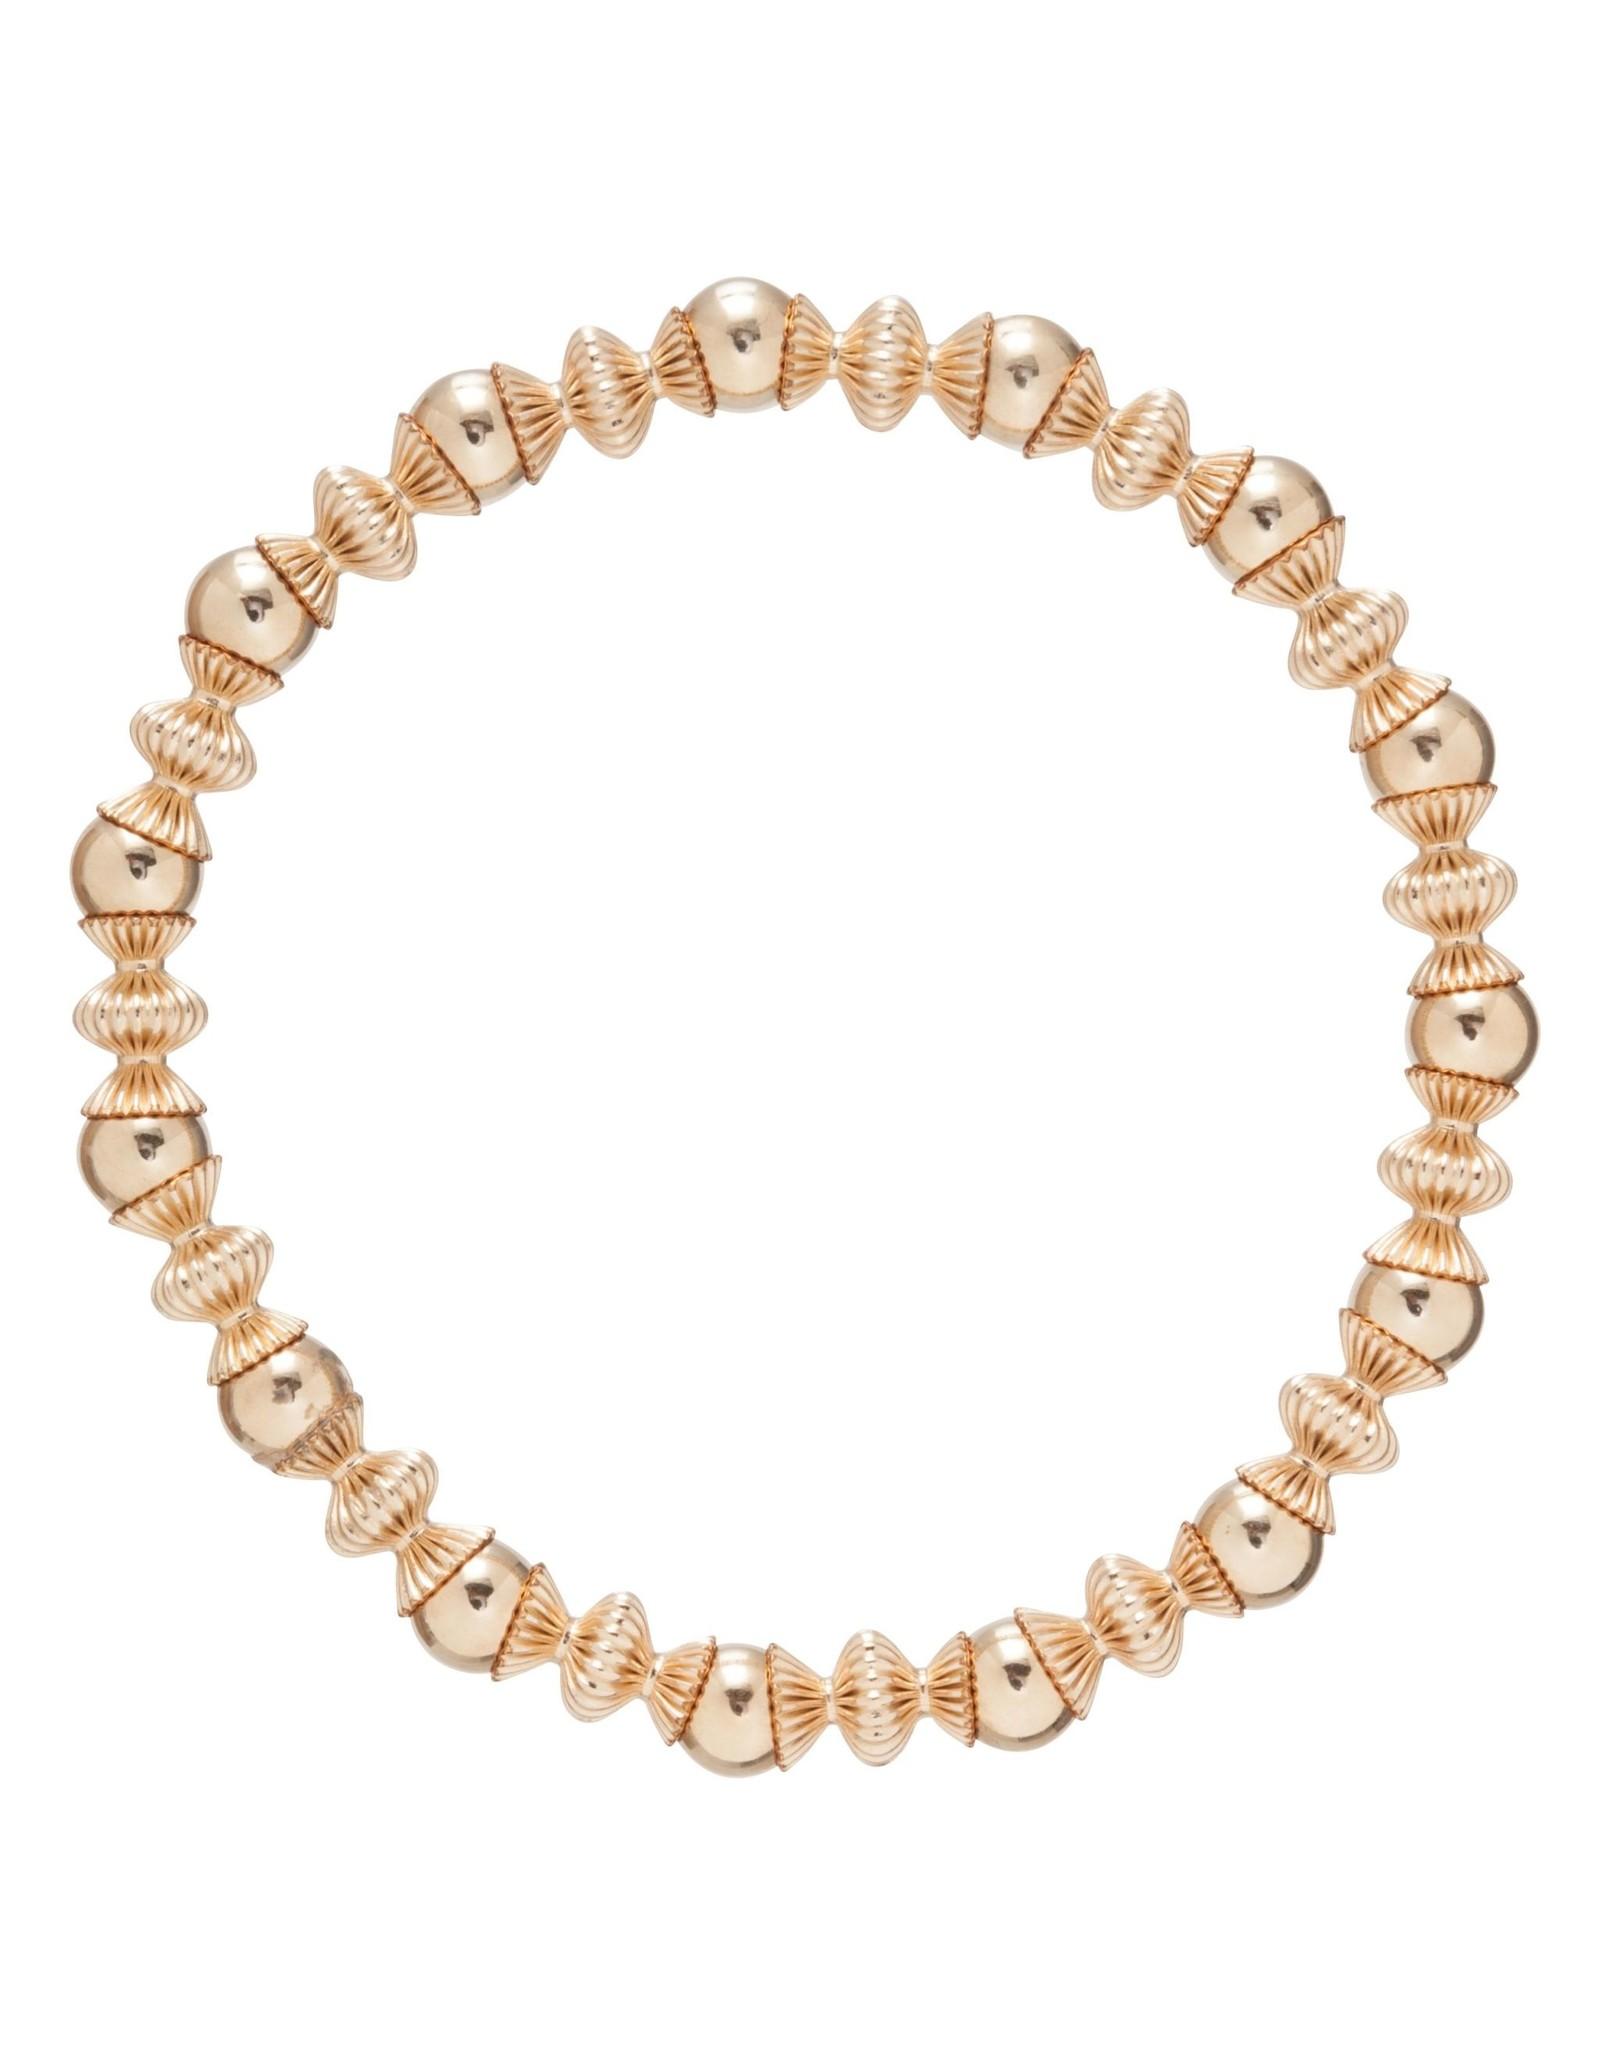 Loyalty Gold 6mm Bead Brace